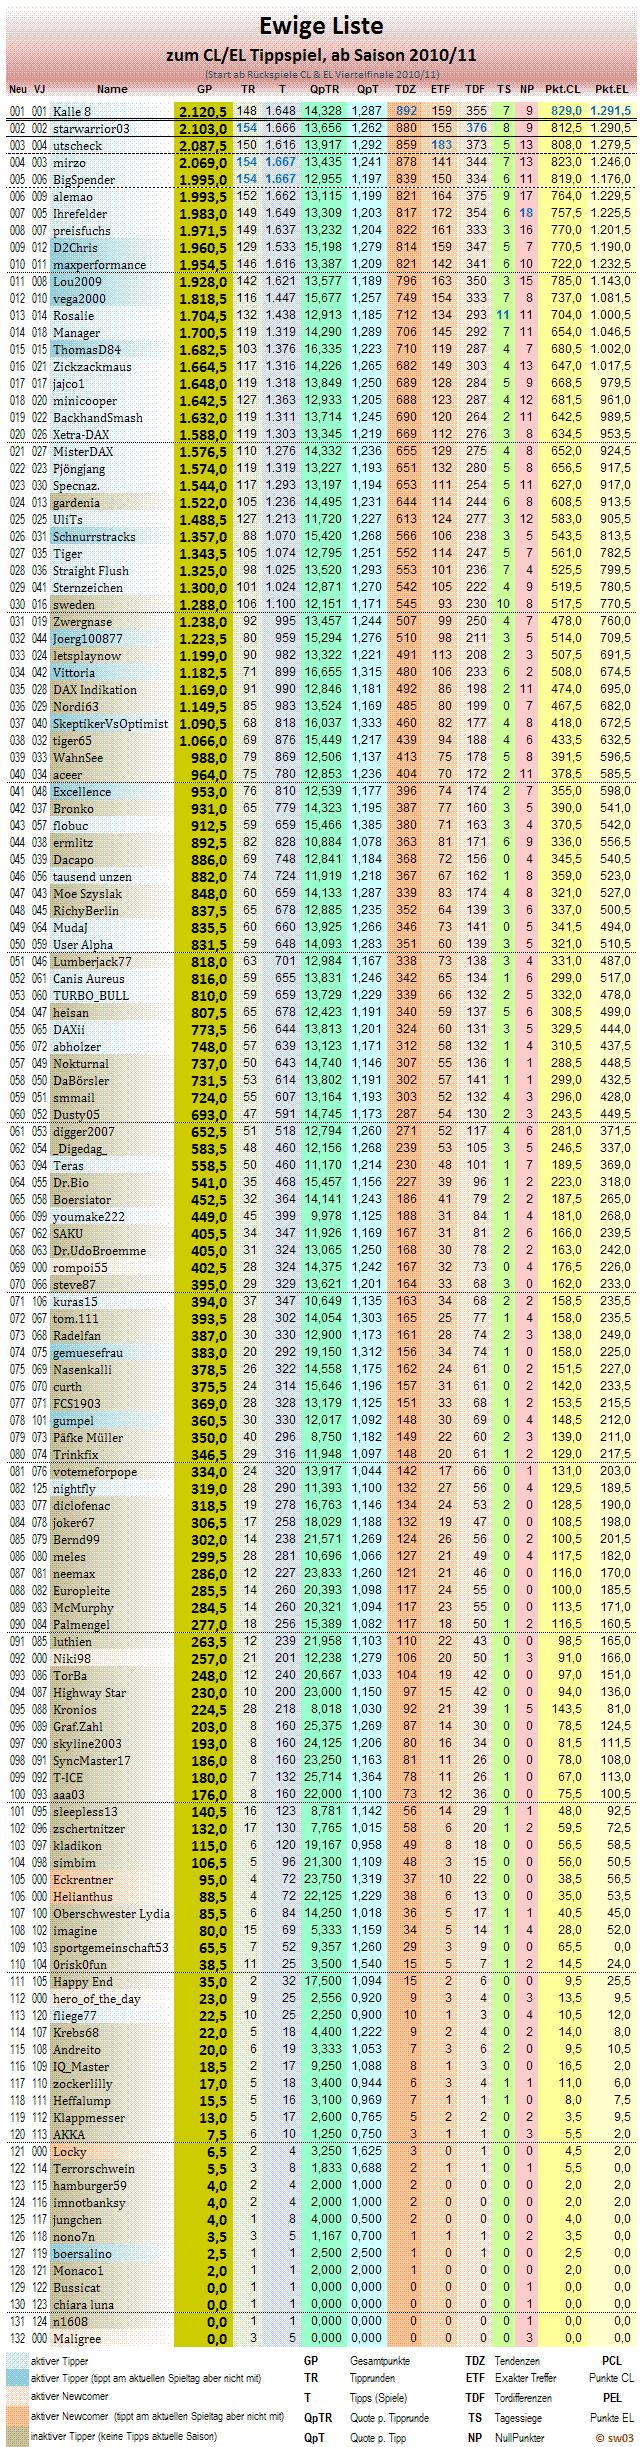 2016-05-22-statistikblock-ewige-tabelle.png